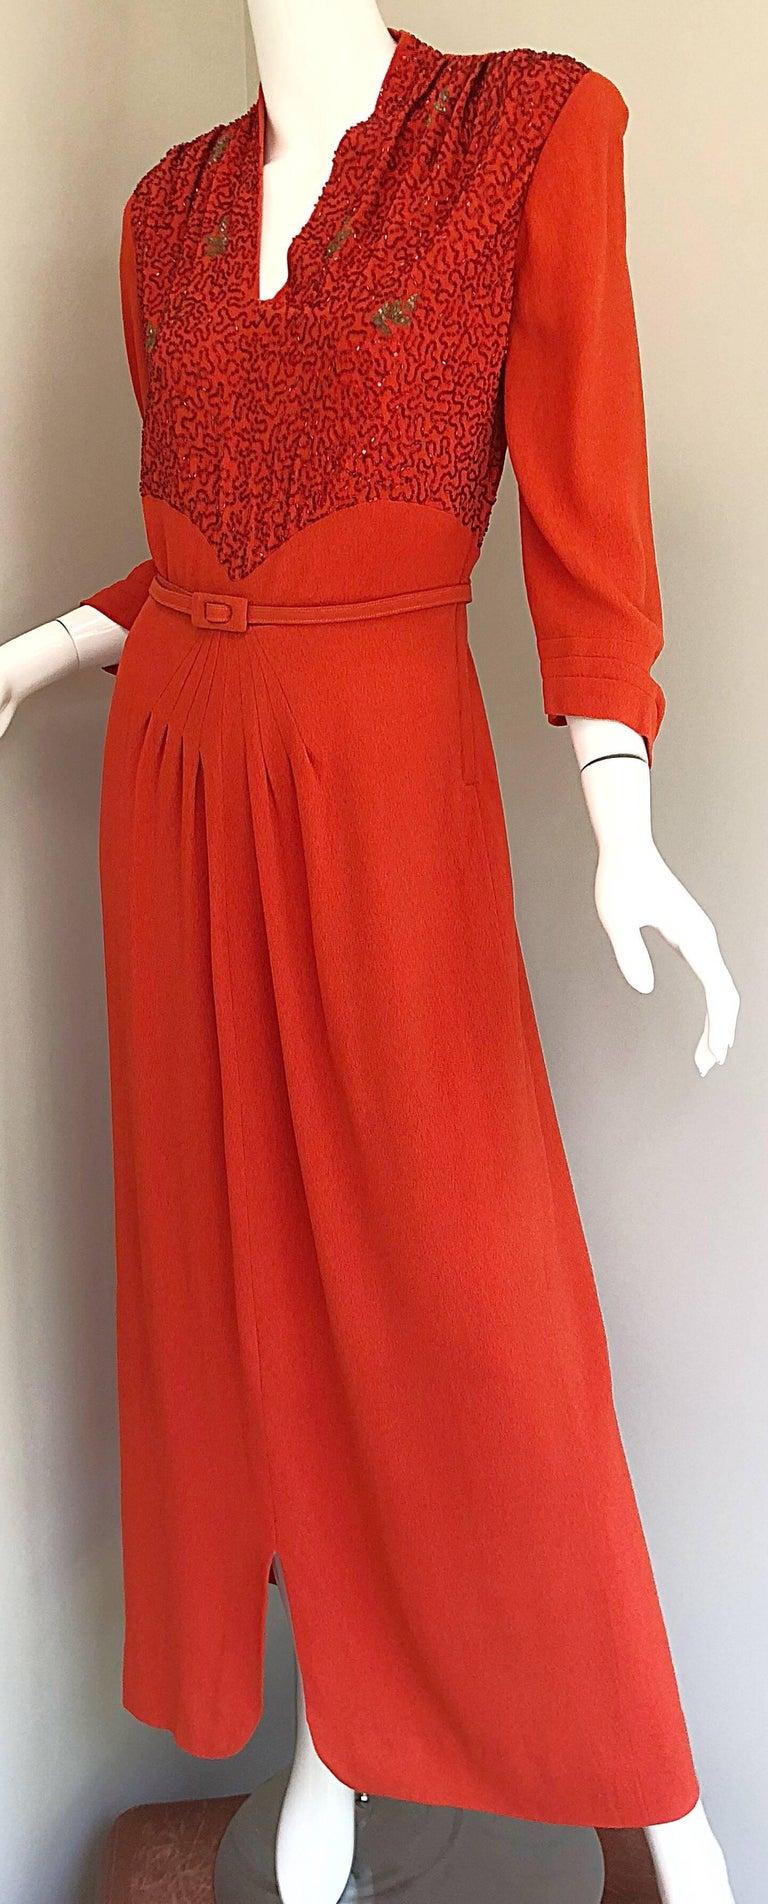 1940s Kornhauser Original Burnt Orange Beaded Vintage 40s Couture Crepe Gown For Sale 6